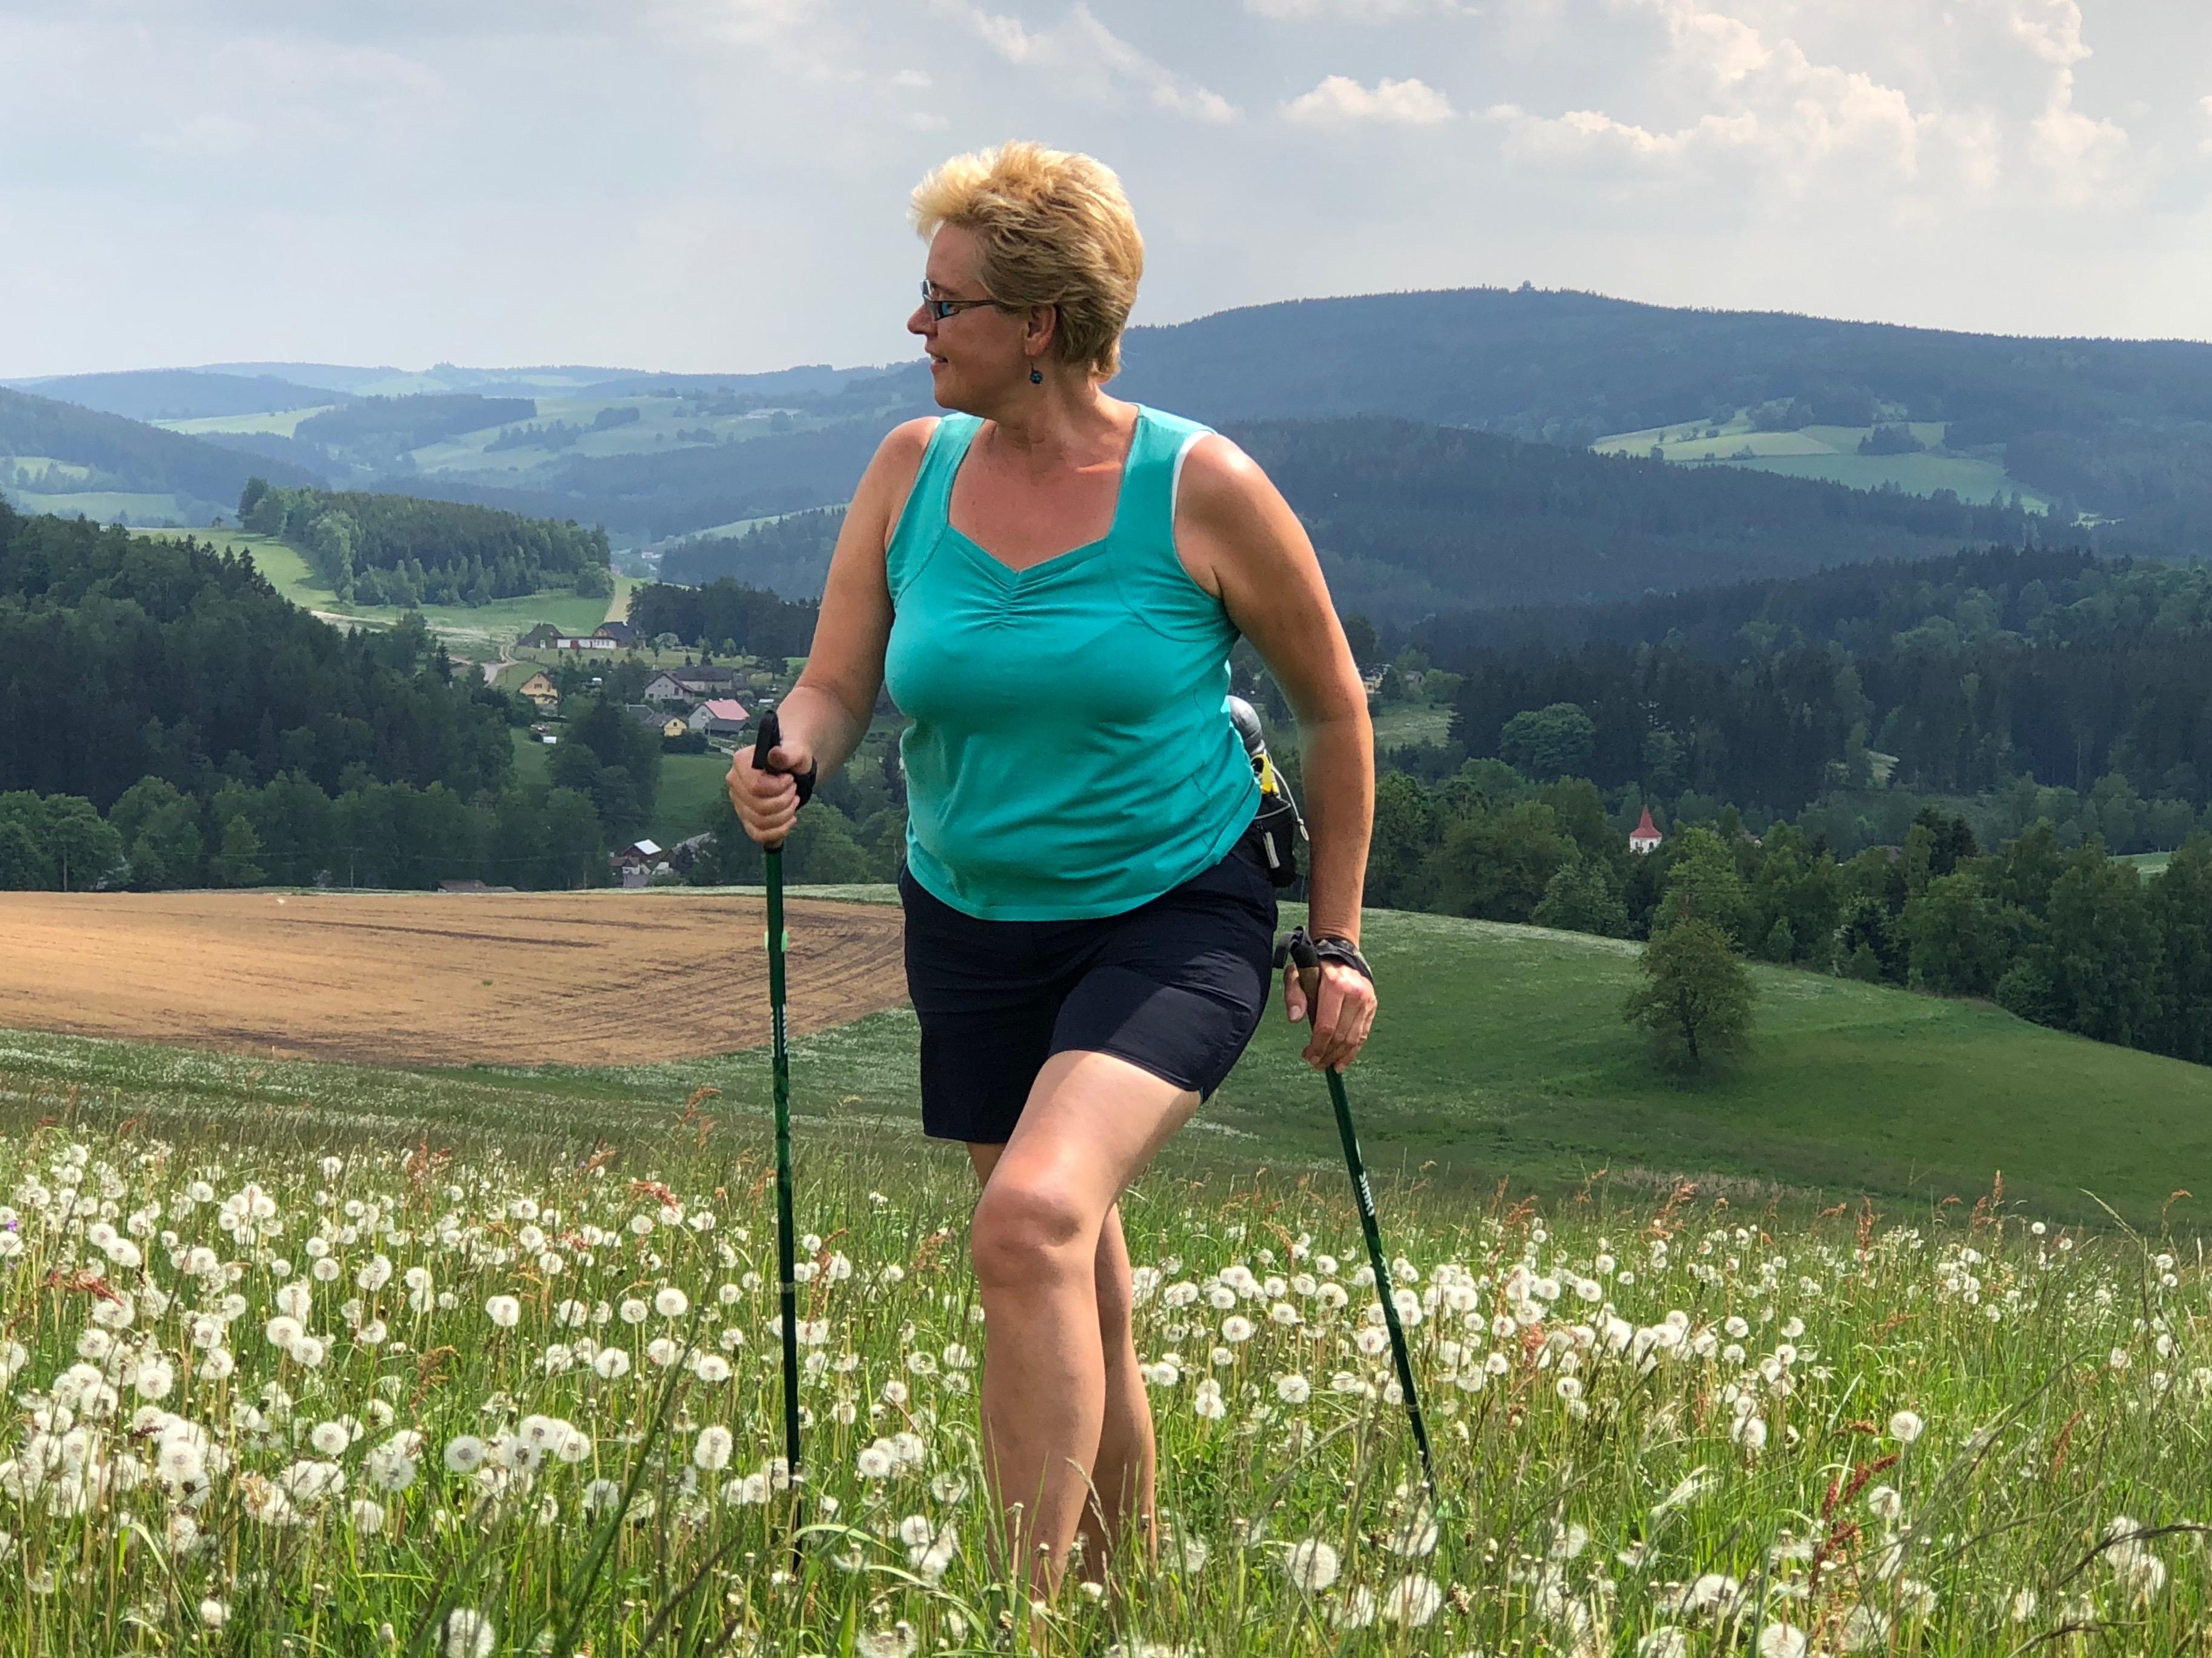 nordic-walking-víkendovka-s-nordic-sports-2018-11.-13.5.-vyber-Lucky-vrch-1-1-z-45-34